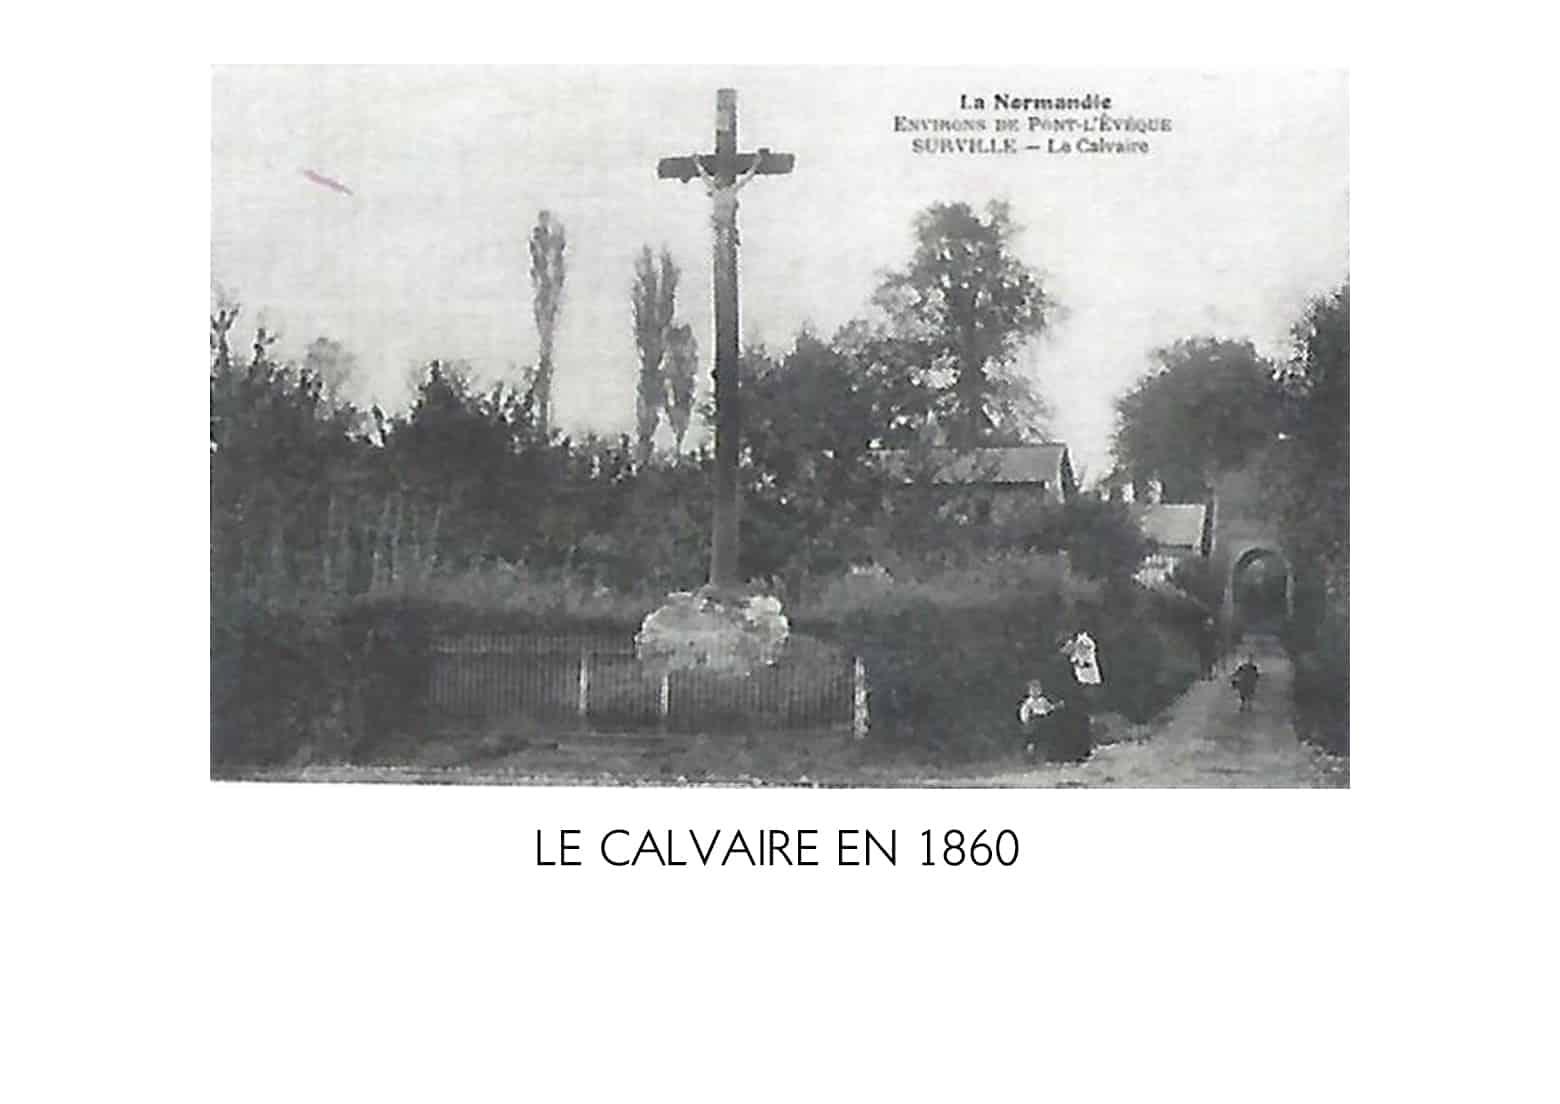 surville-Calvaire-1860